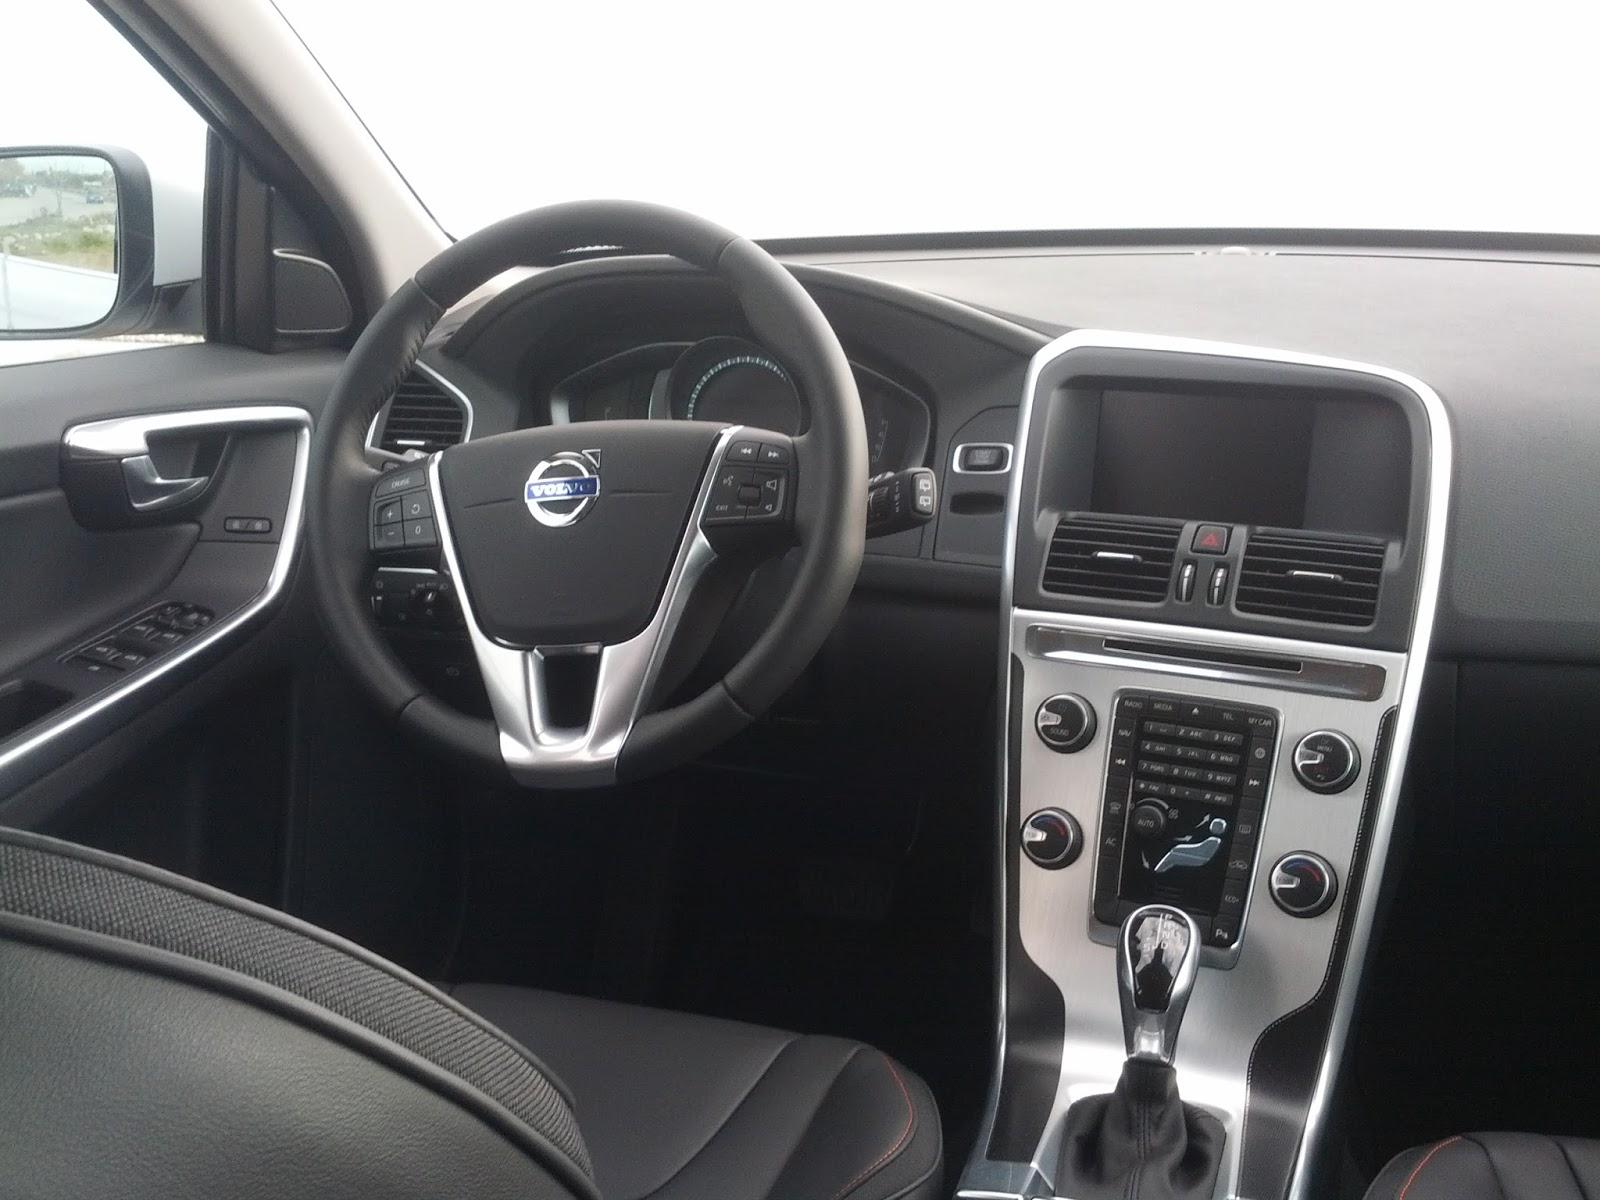 IMG 20151209 142808 Γιατί το Volvo XC60 είναι εθιστικό